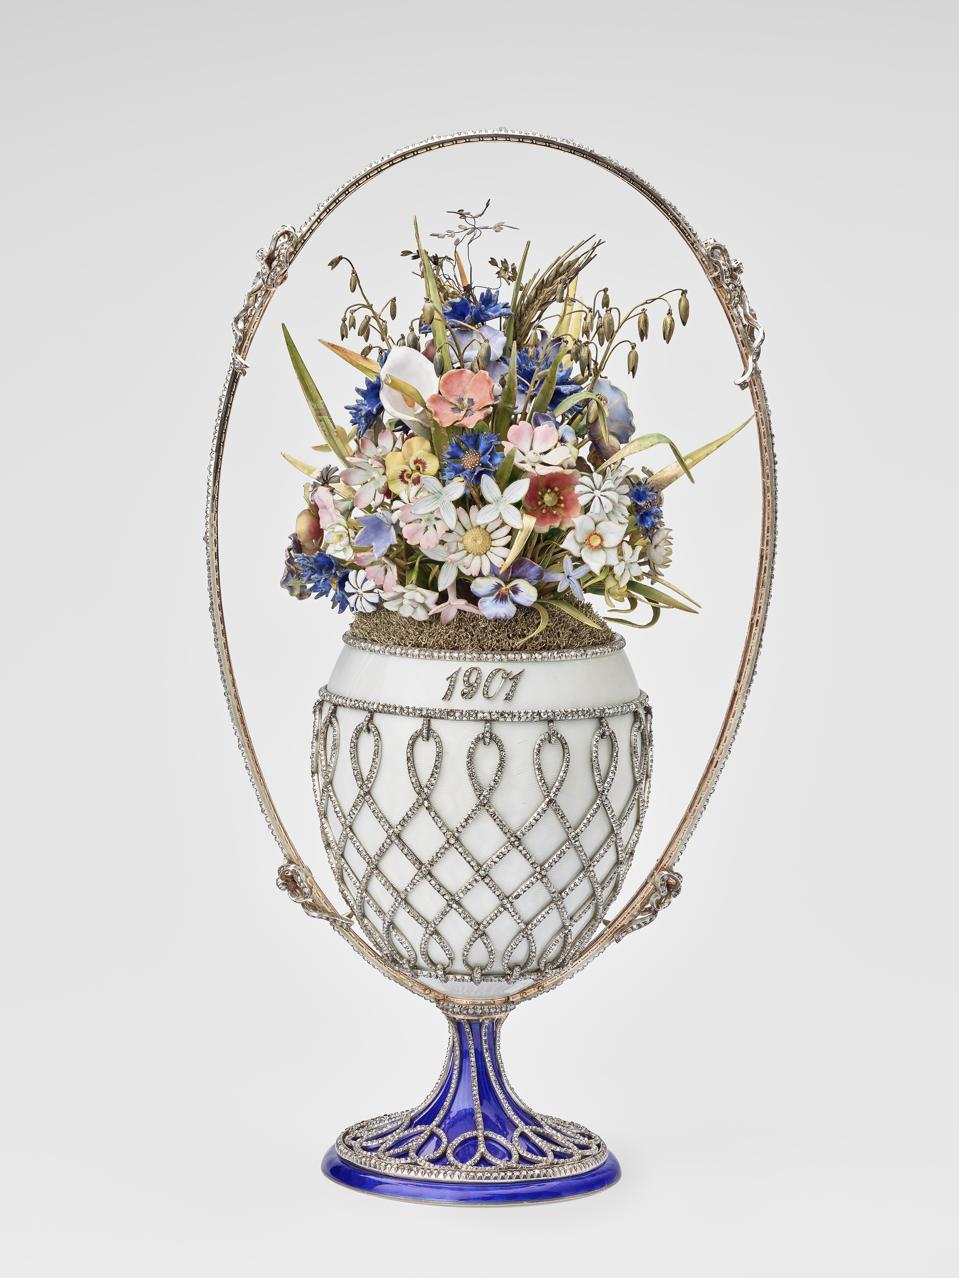 Basket of flowers egg, by Fabergé. Silver, parcel-gilt, gold, guilloché enamel, diamonds, 1901 Royal Collection Trust © Her Majesty Queen Elizabeth II 2021